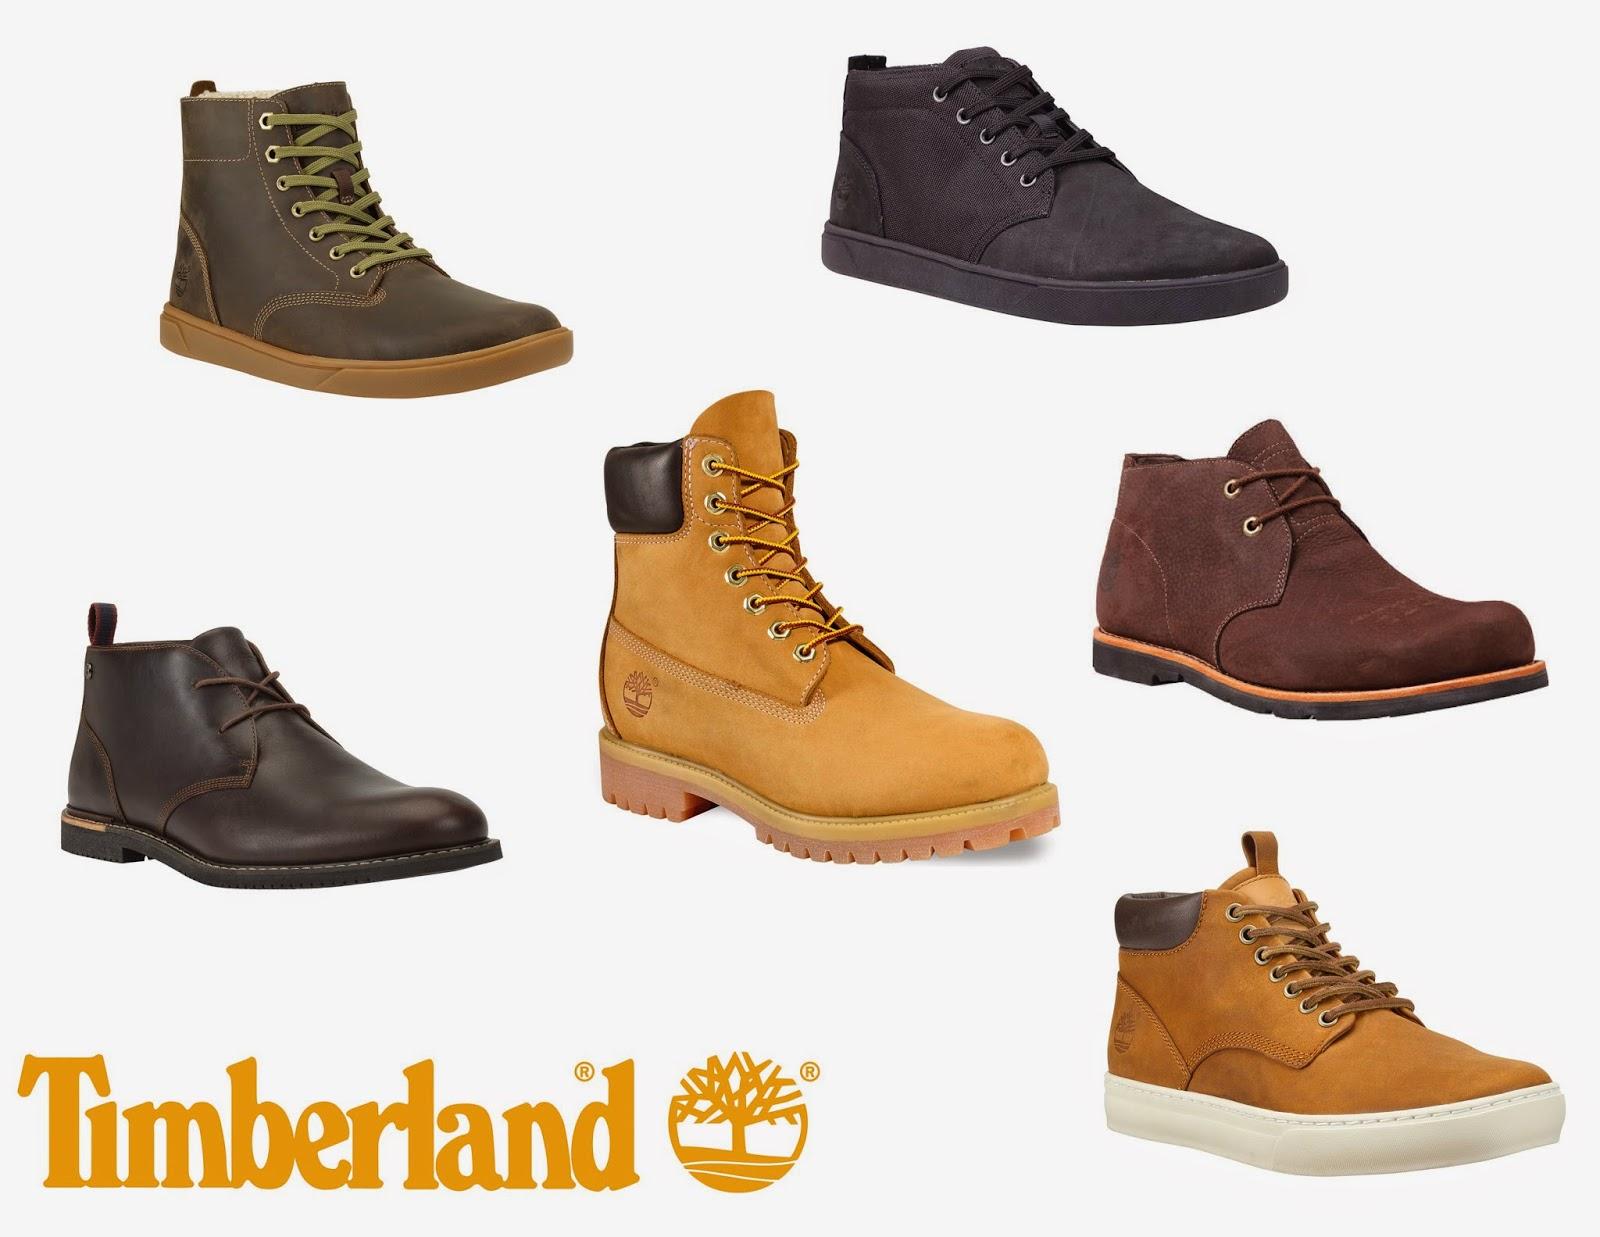 5588f6f2bbb59 Timberland Y My Sport Old Zapatos Bototos De Otoñoinvierno 2015 dOn7wXq